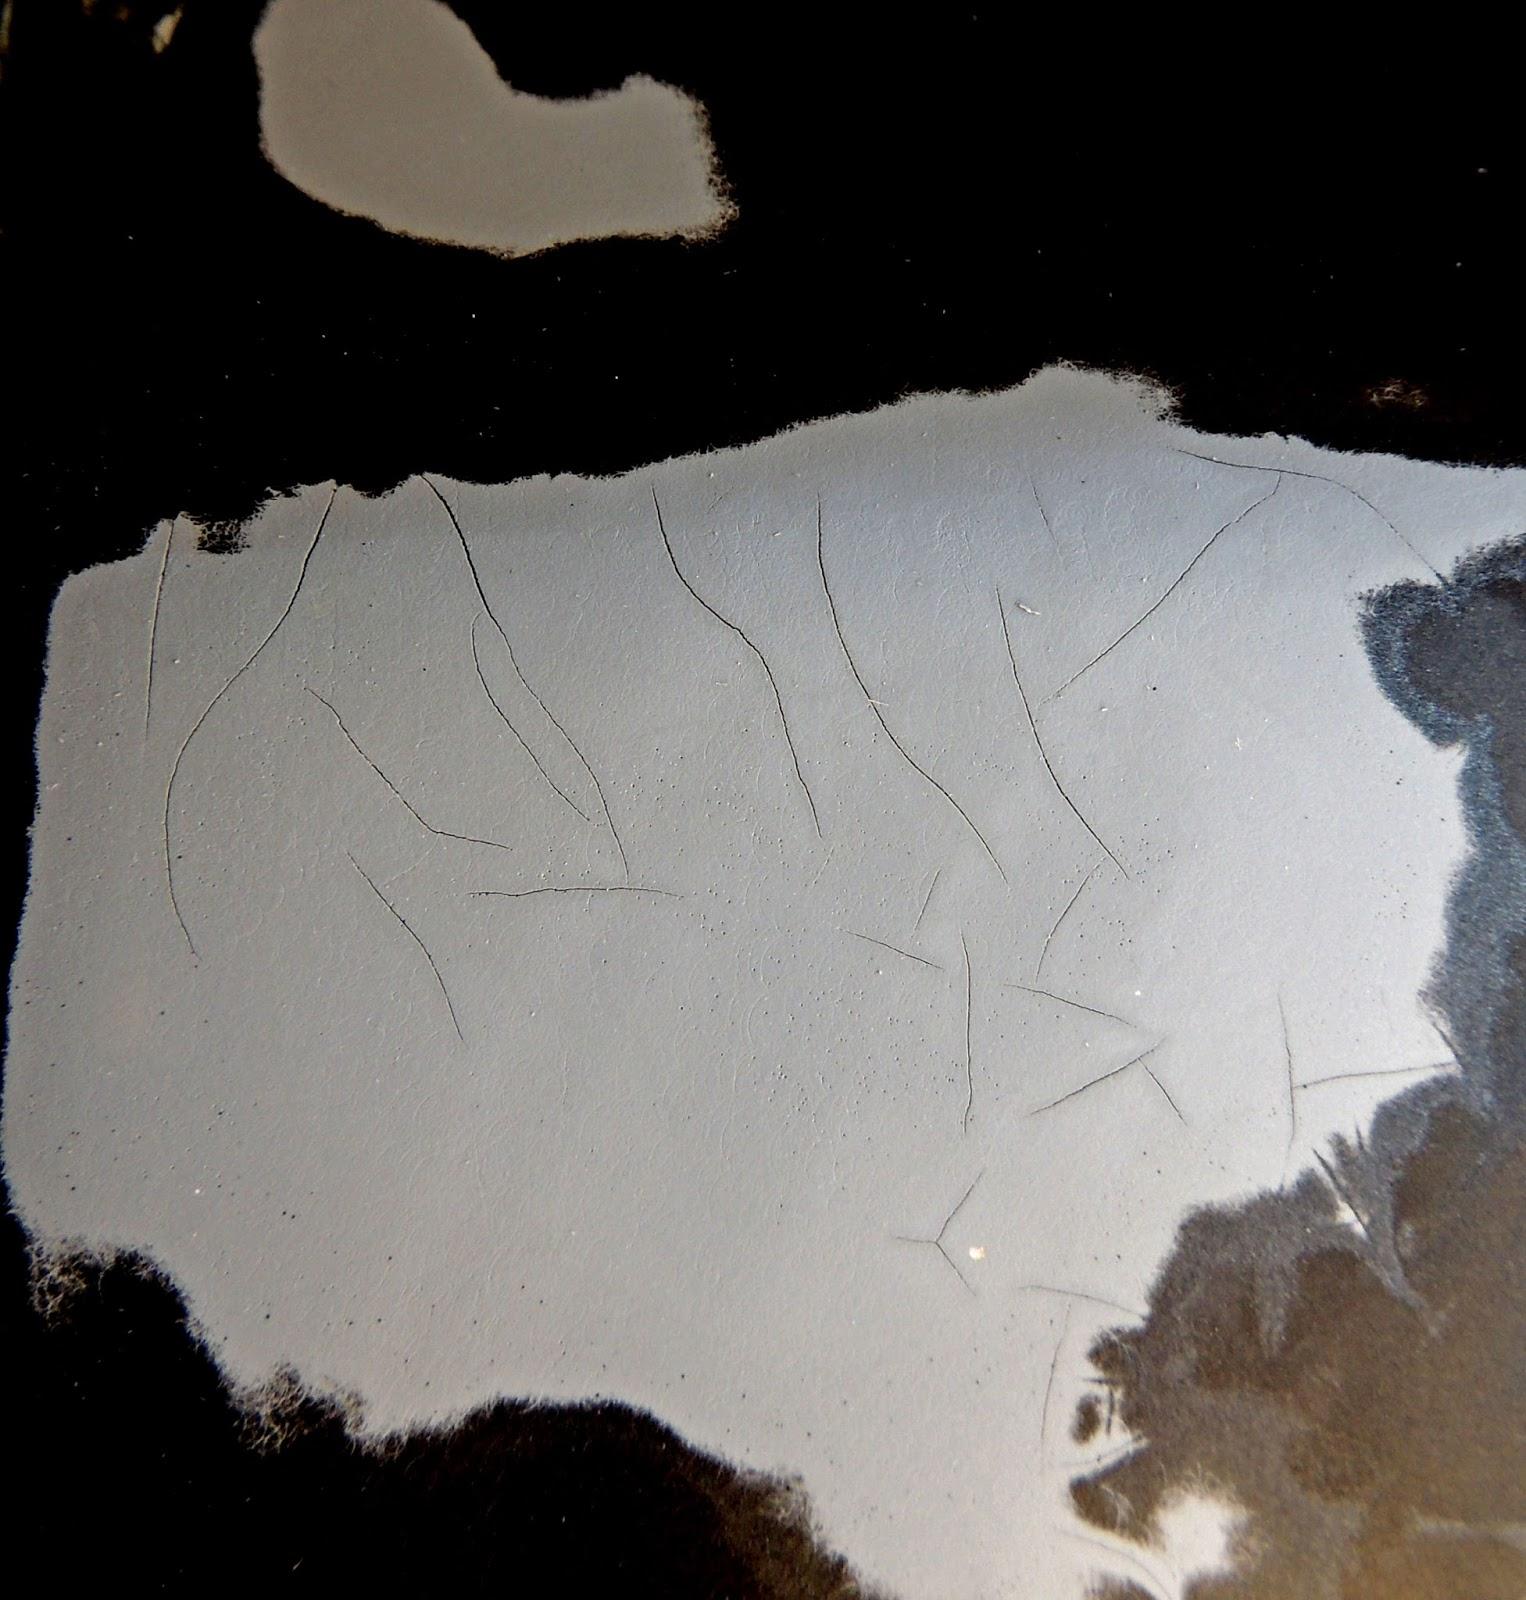 cracked fiberglass motorcycle saddlebags